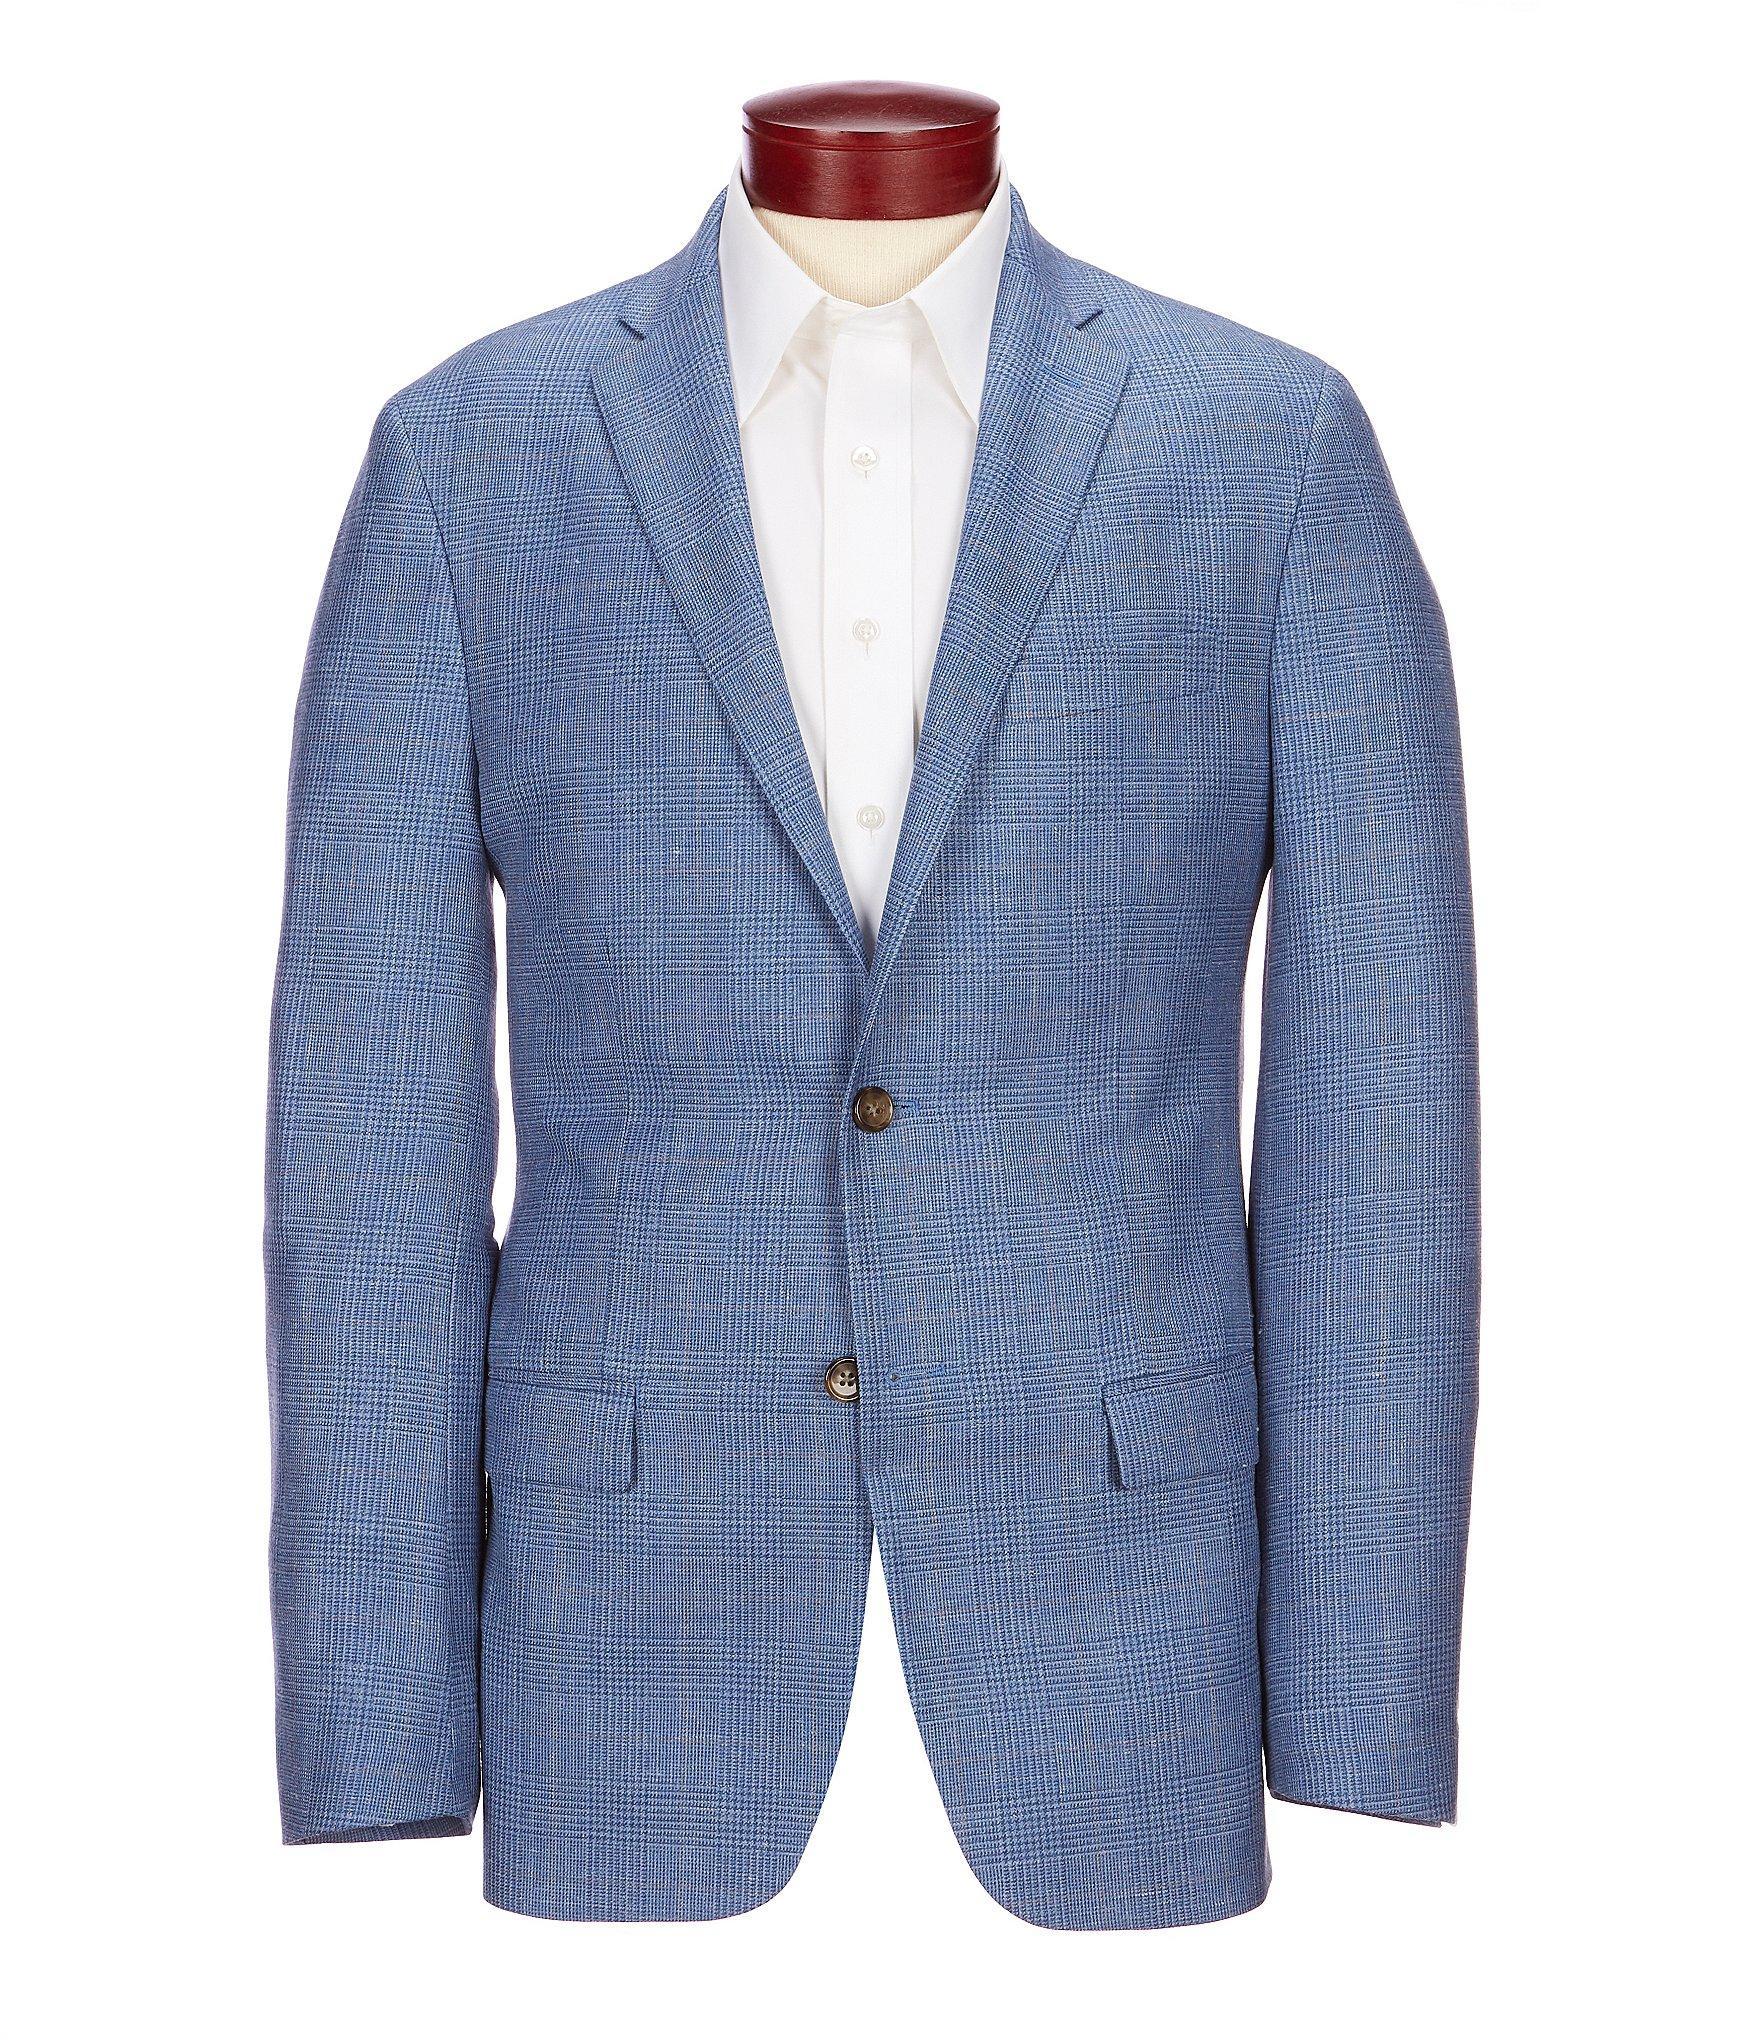 5ab2ec3c42b2 Lyst - Ralph By Ralph Lauren Slim Fit Plaid Sportcoat in Blue for Men